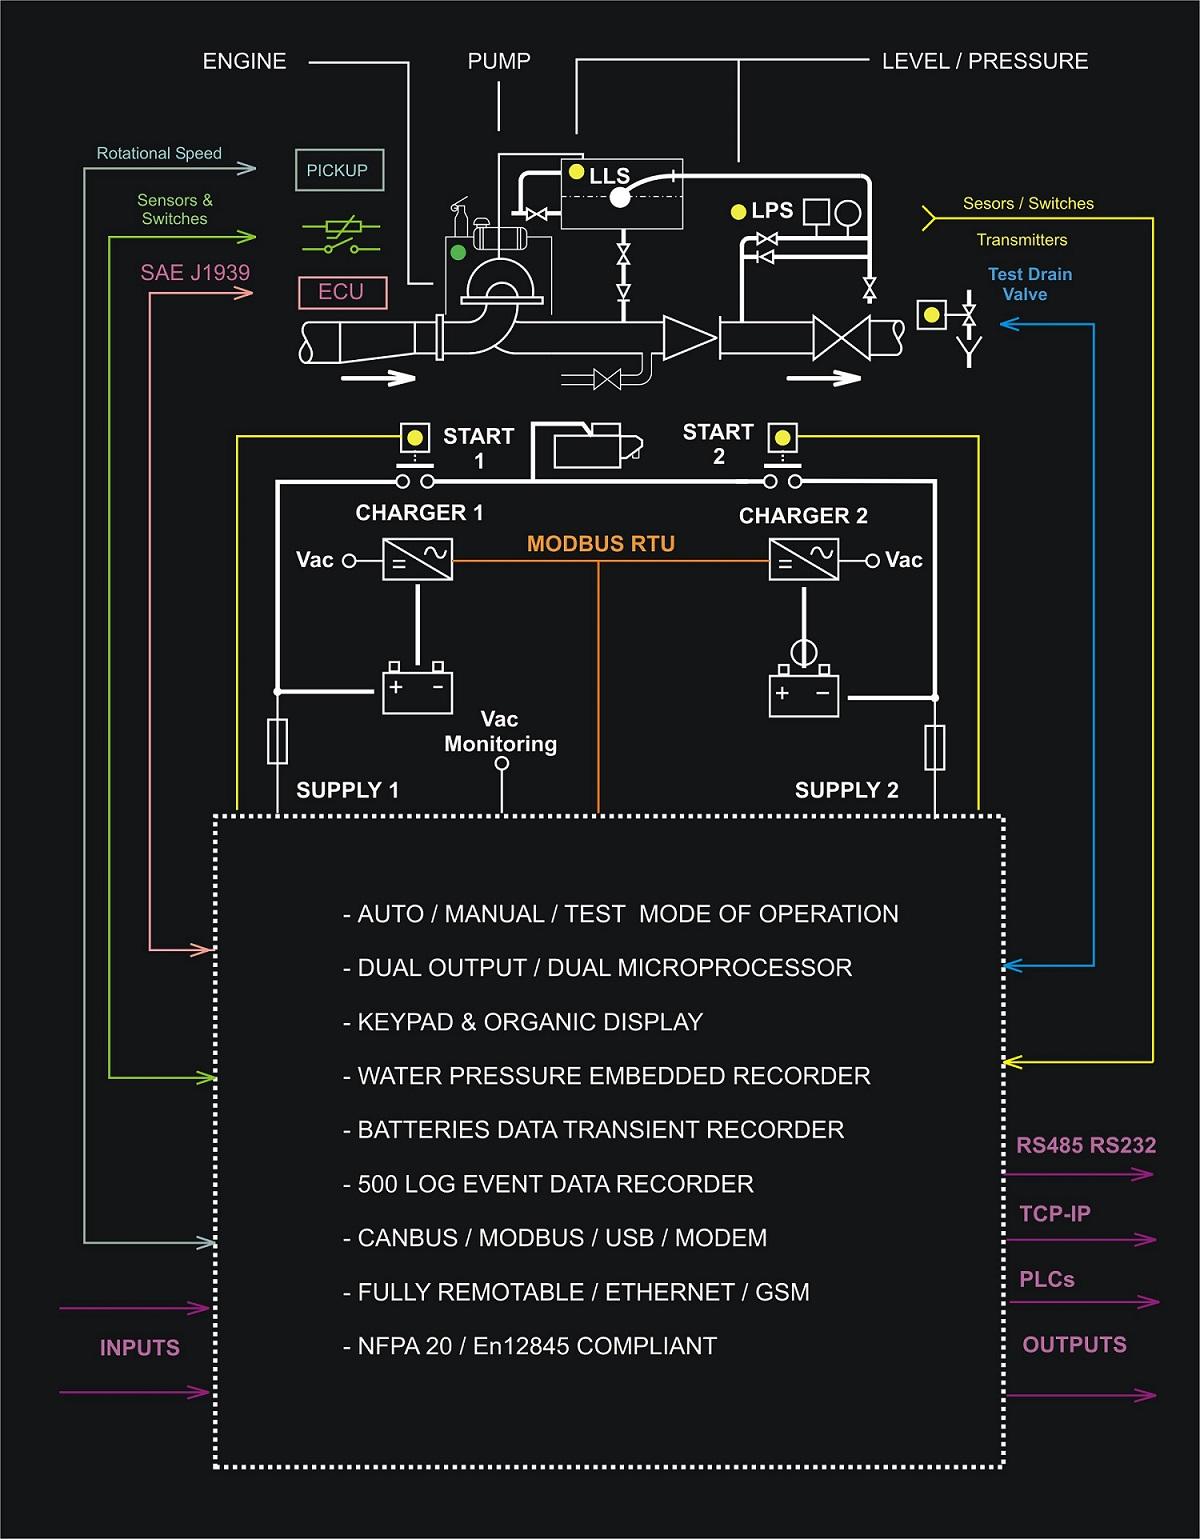 fire pump wiring diagram ready remote 24921b nfpa 20 controller  genset